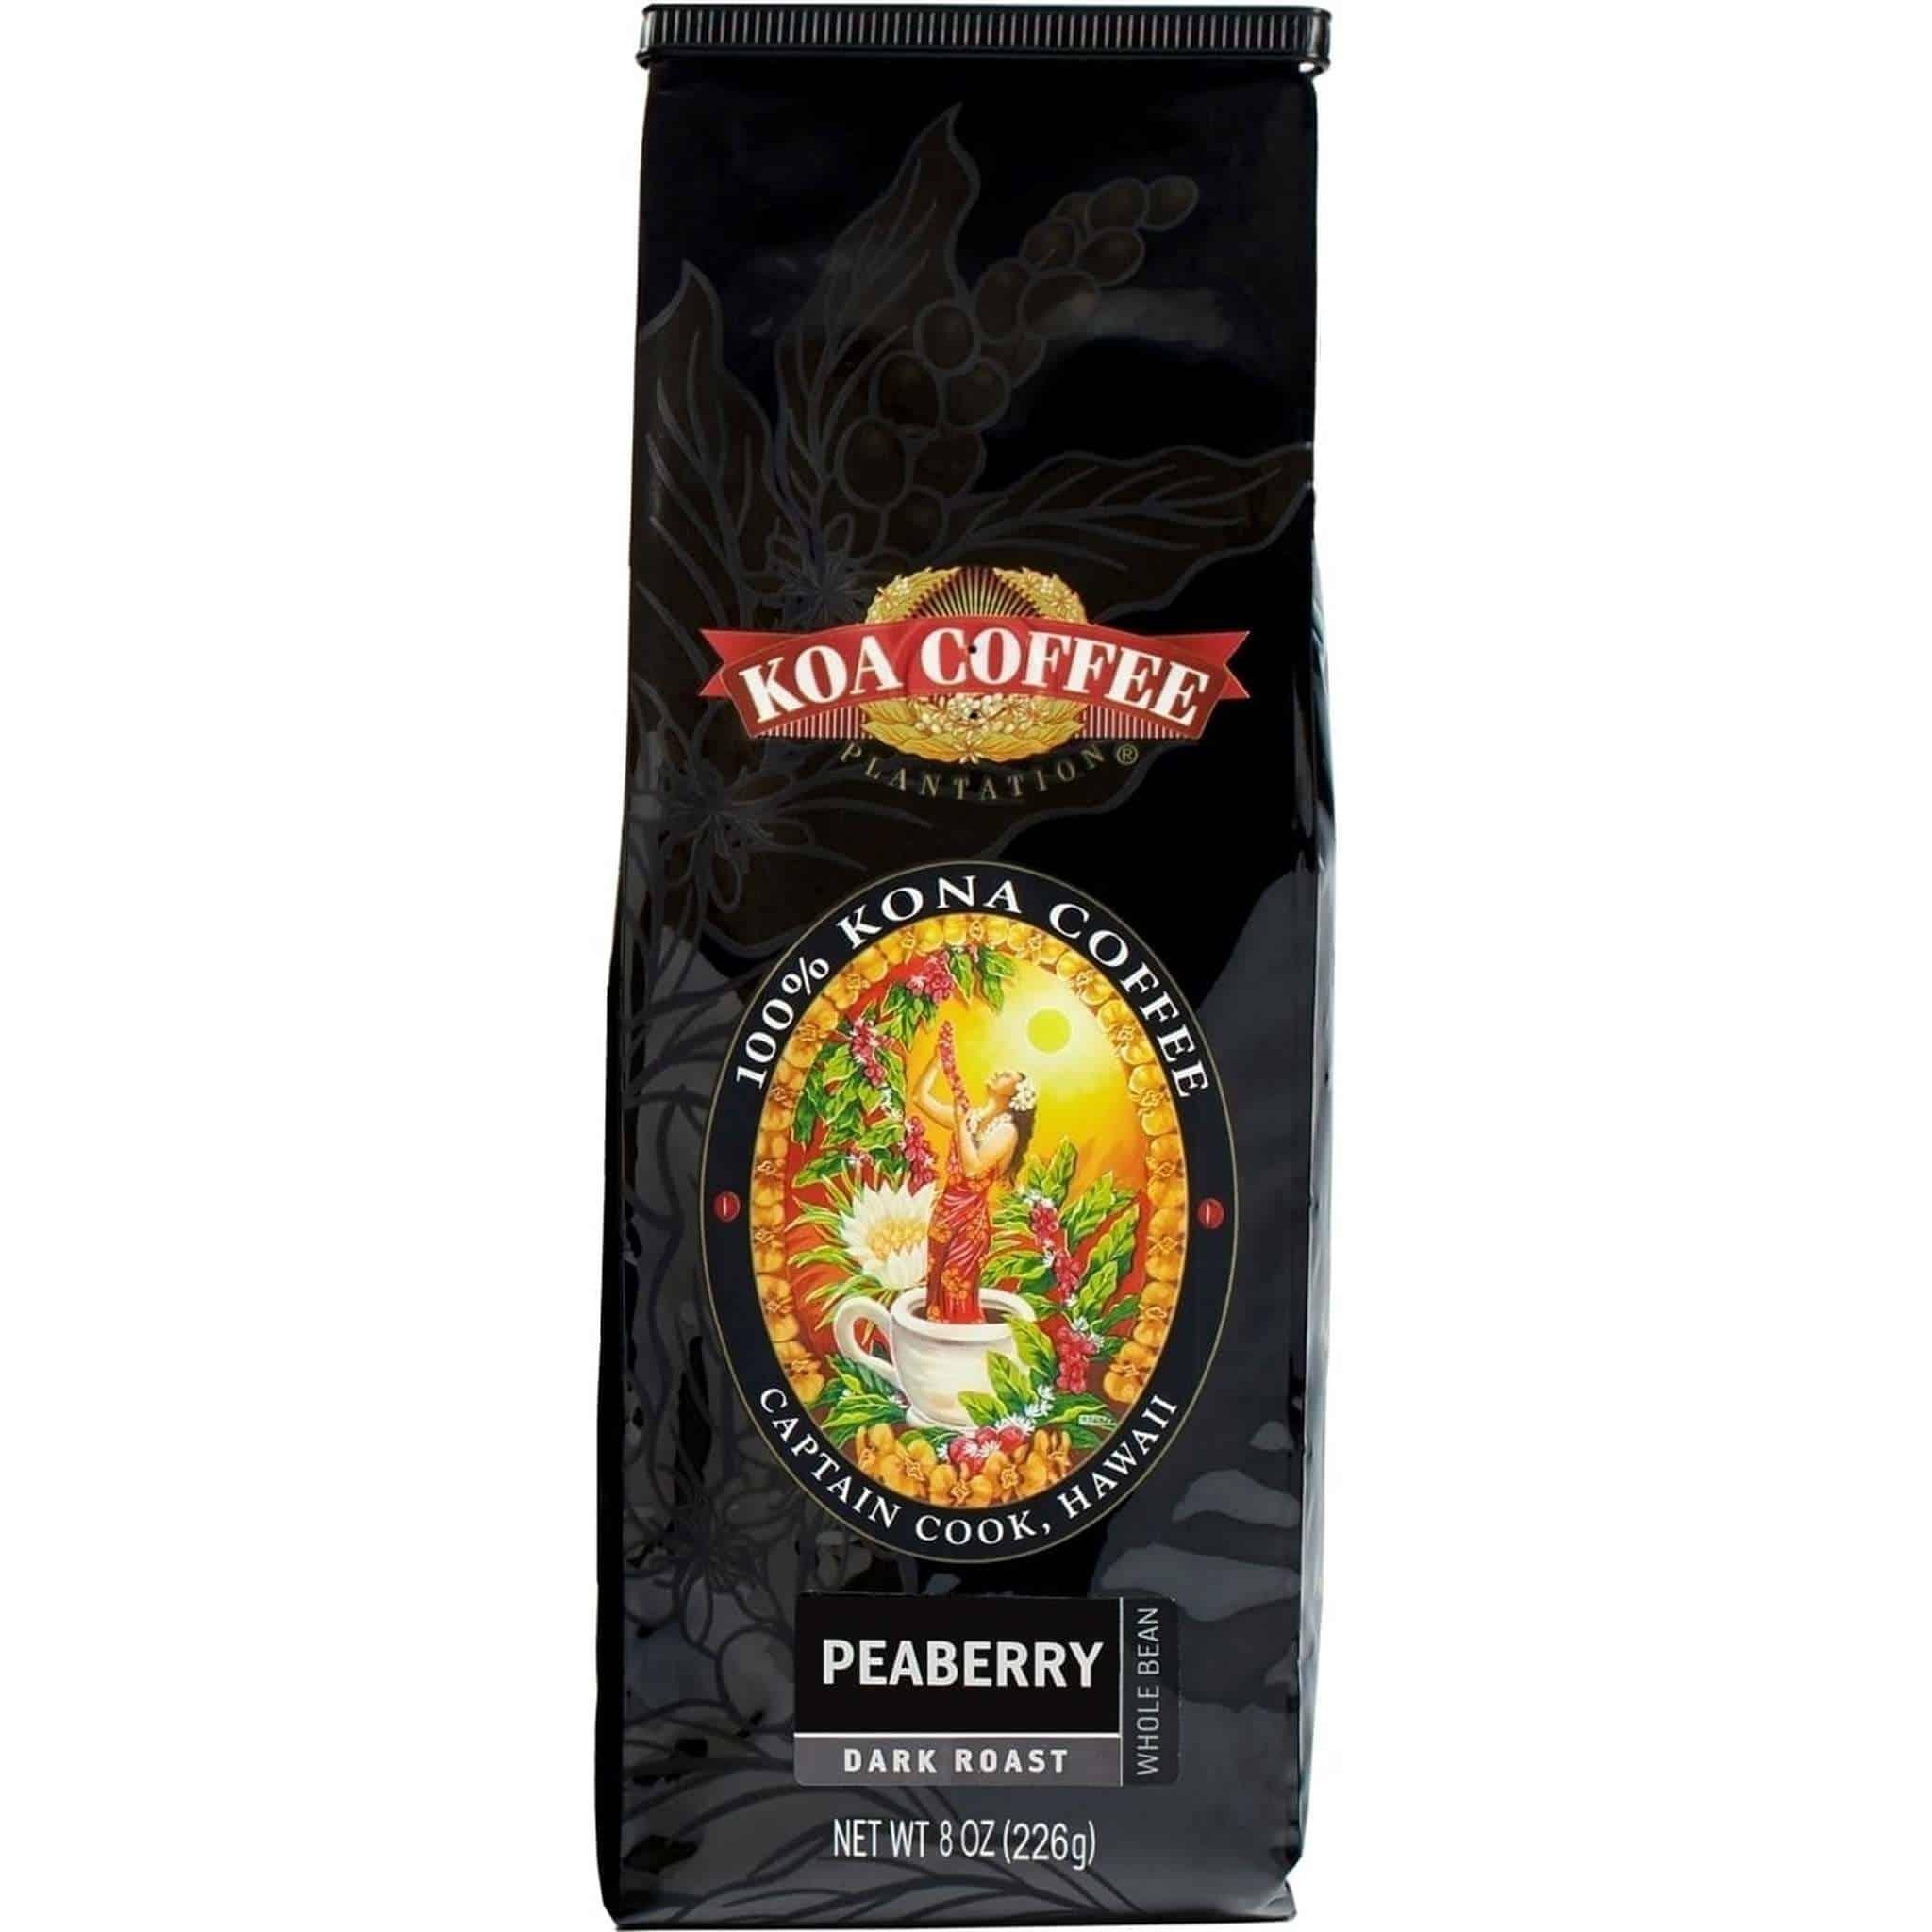 Koa coffee dark roast